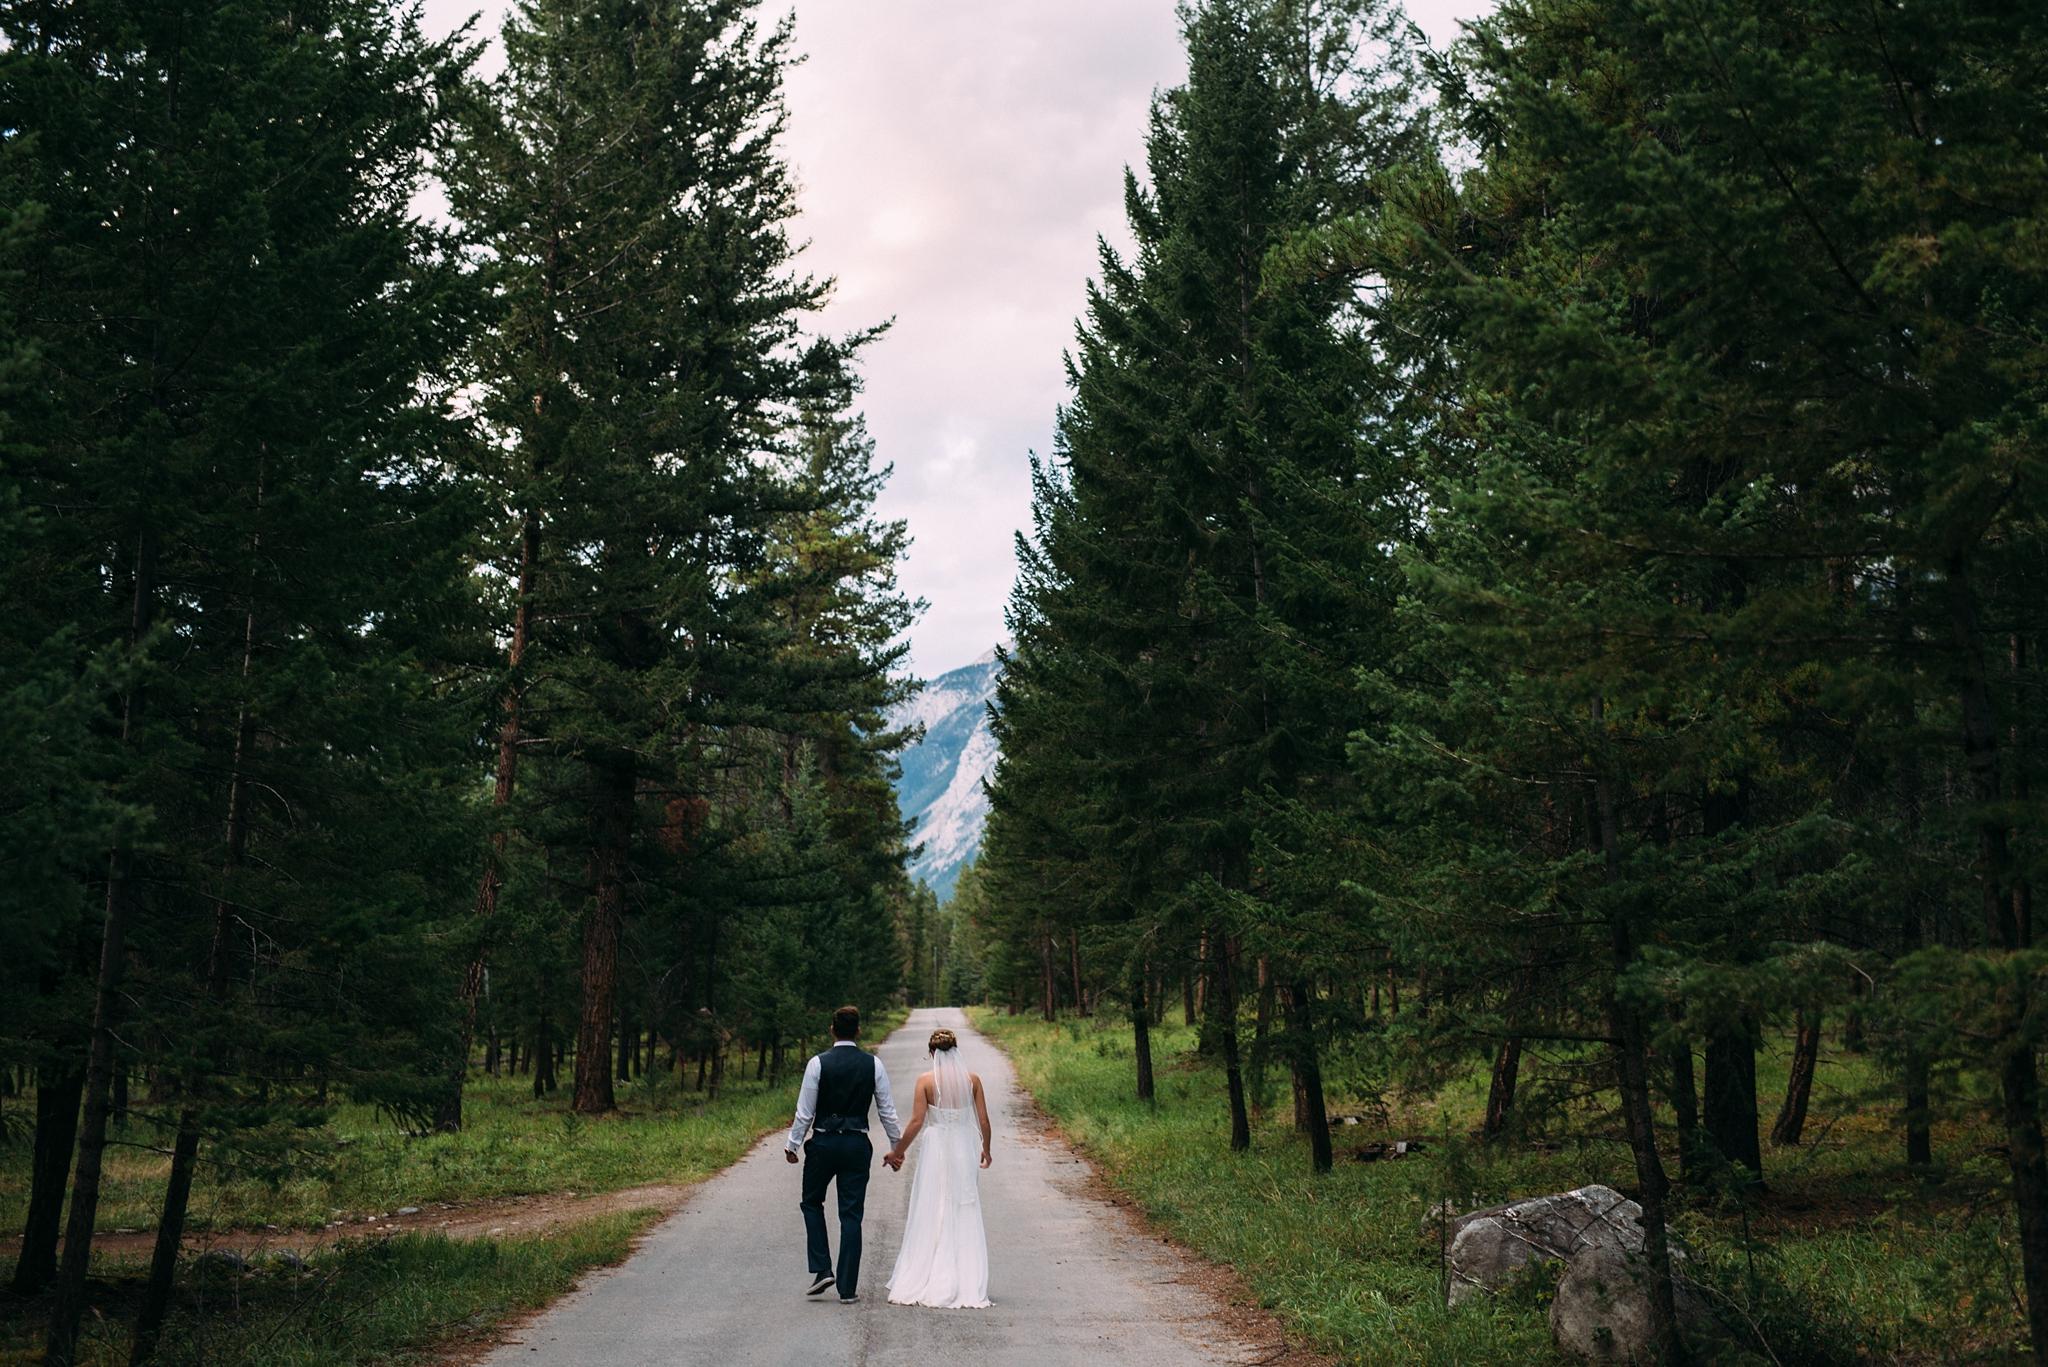 kaihla_tonai_intimate_wedding_elopement_photographer_2556